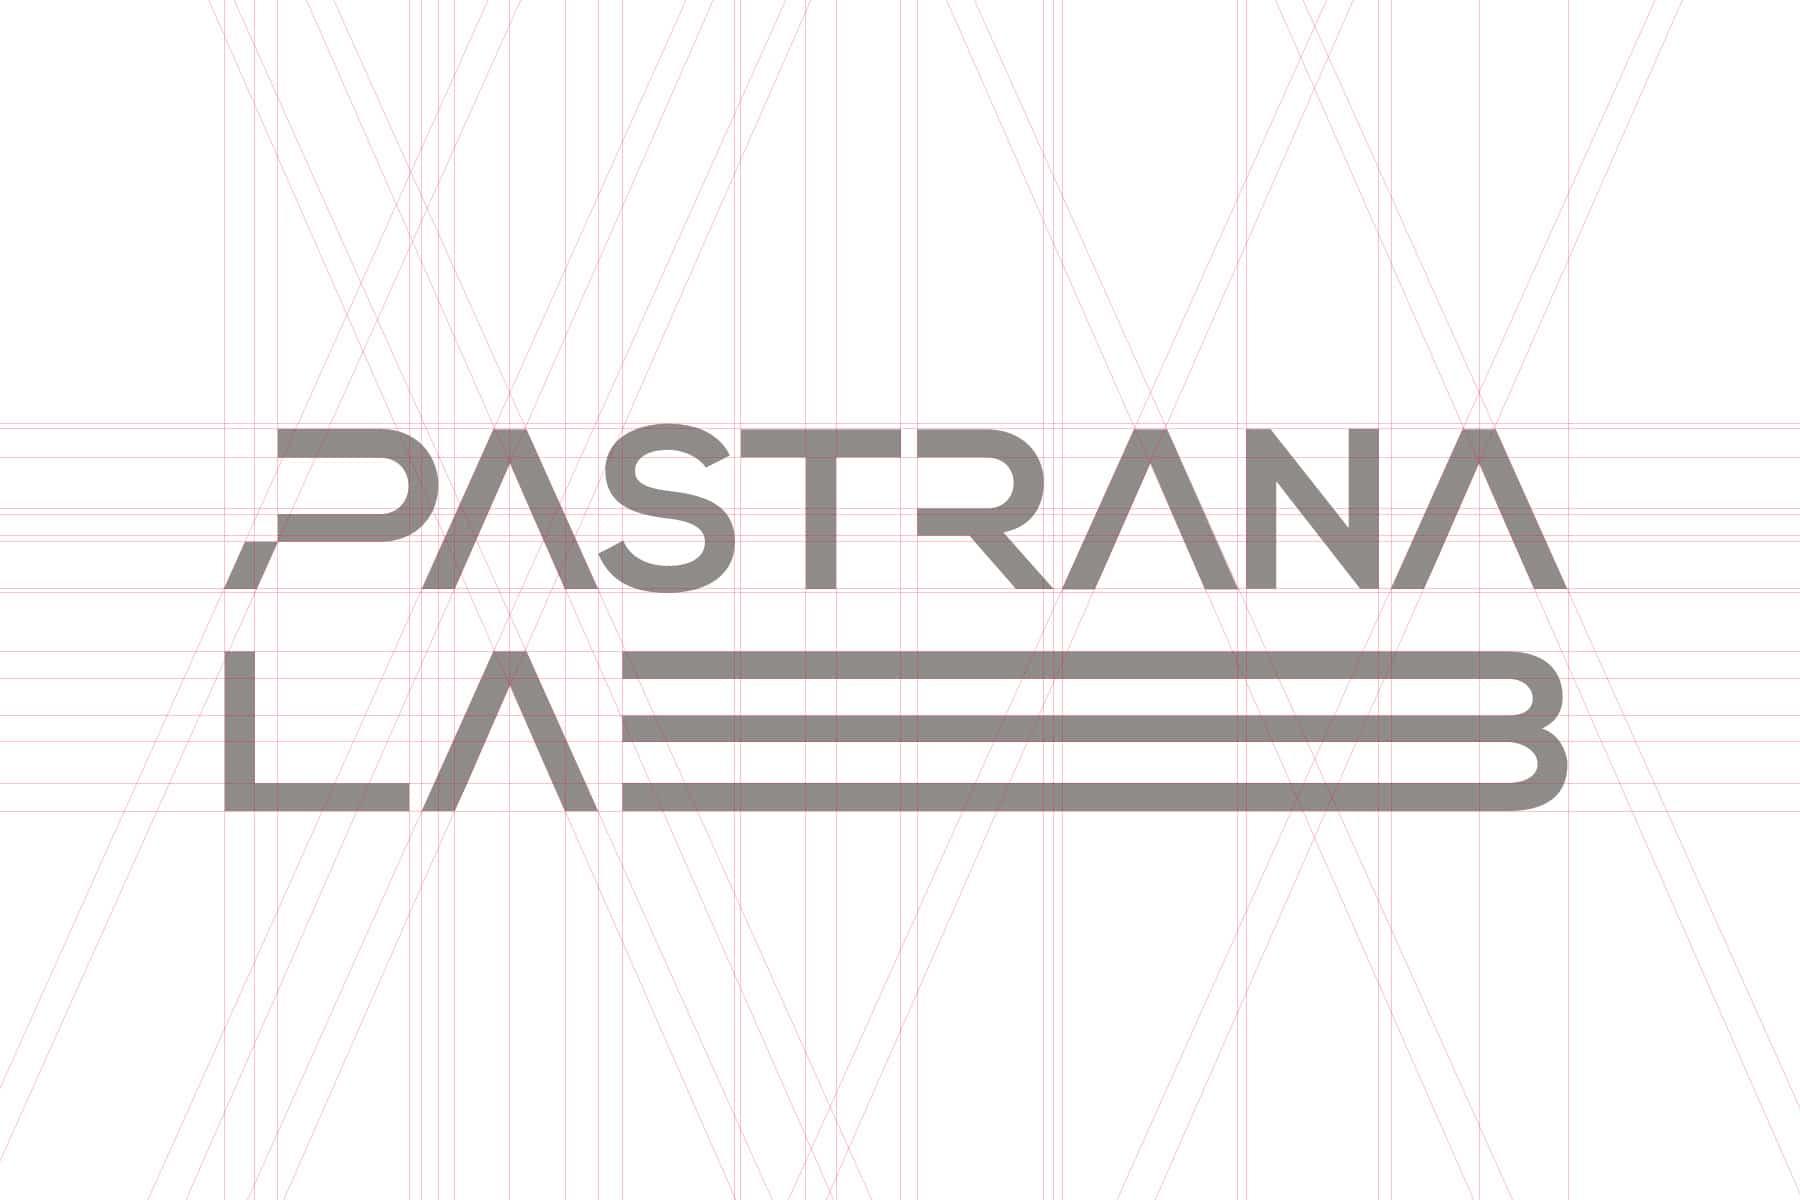 pastranalab_n3